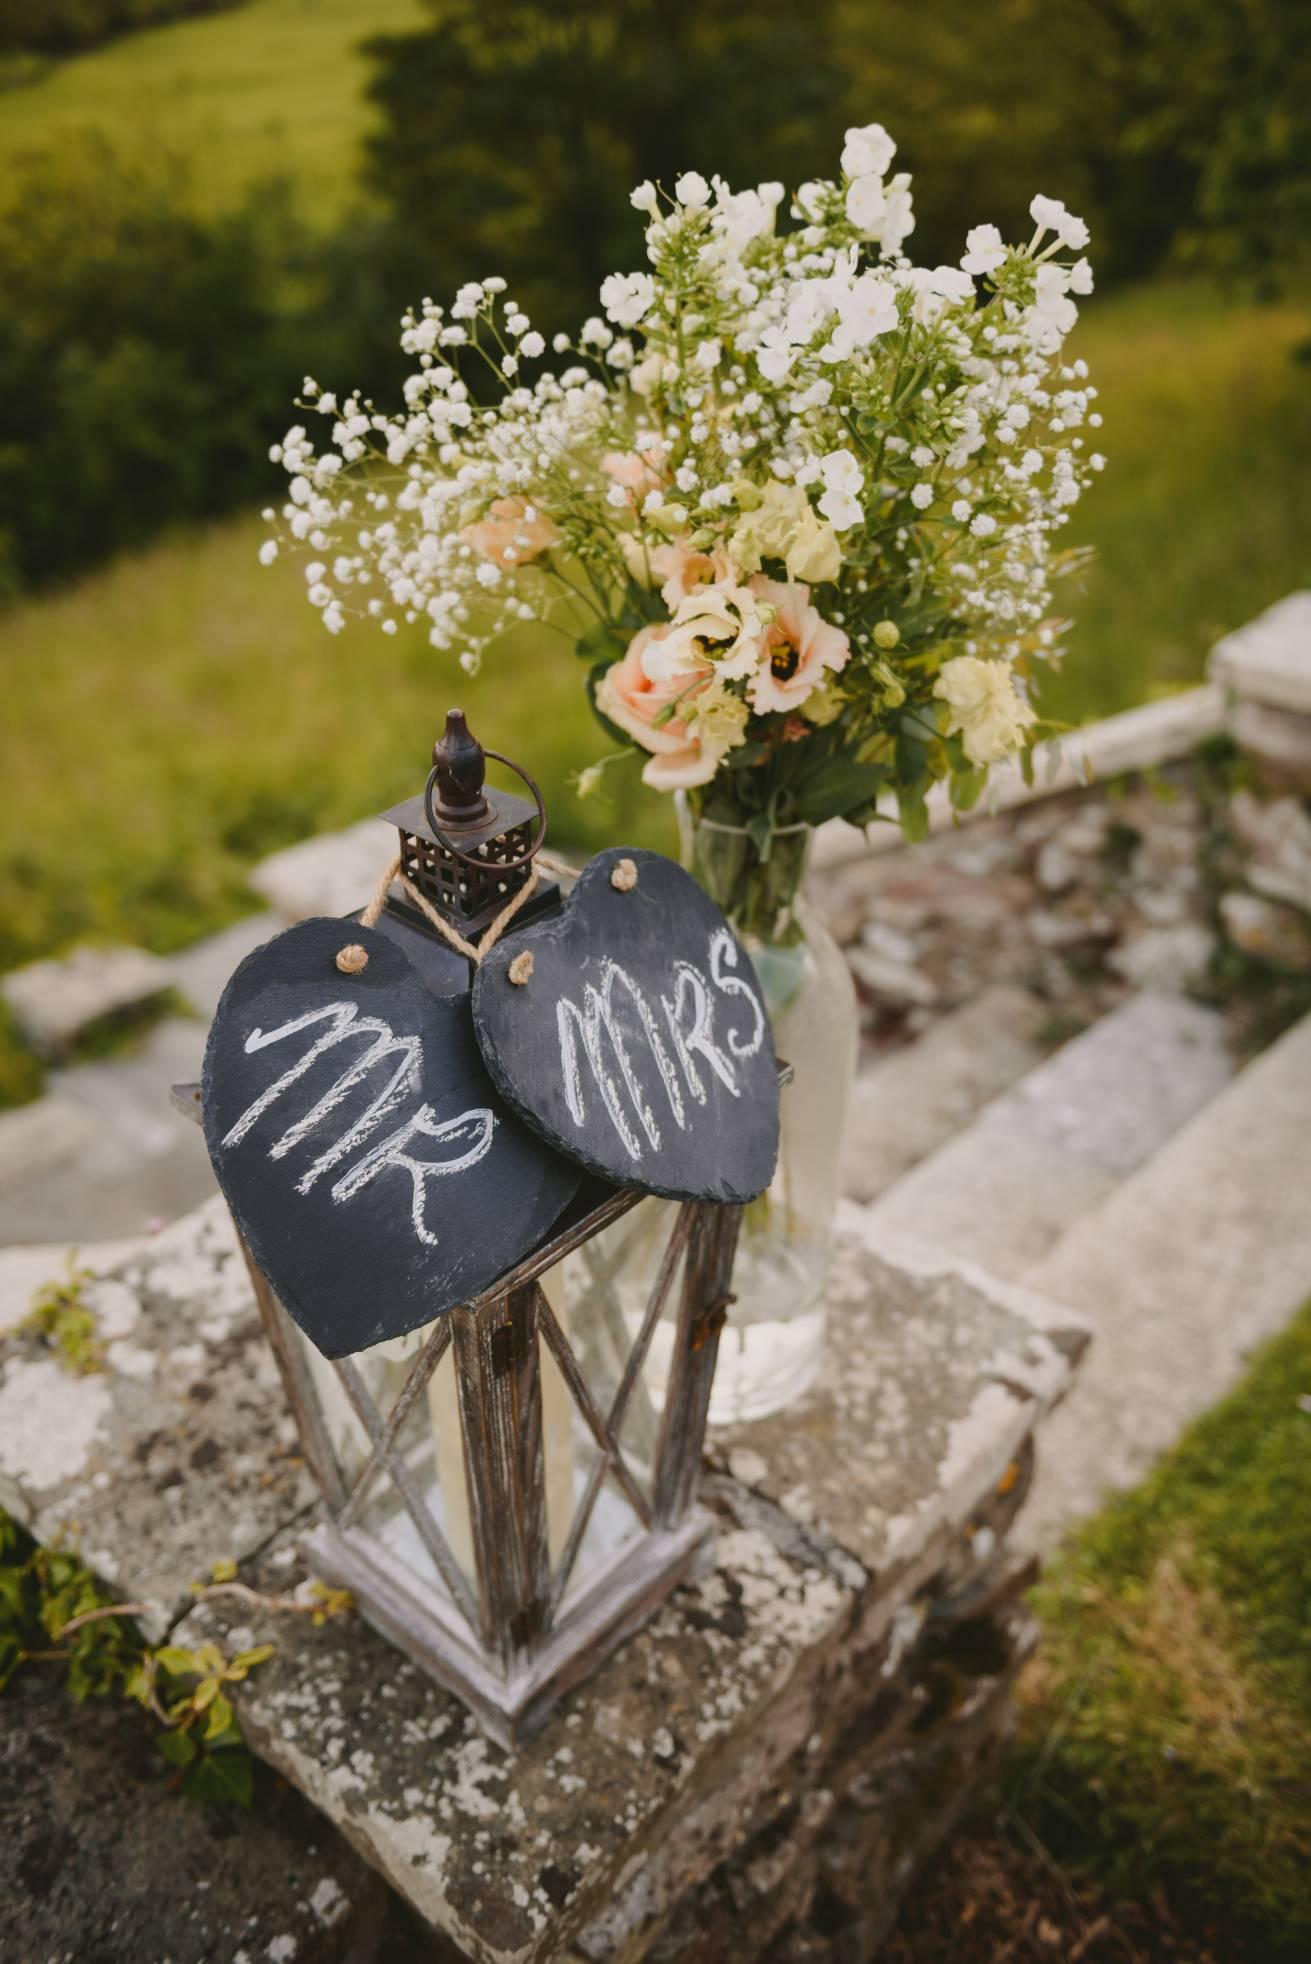 Outdoor wedding venue at Pamflete House, Flete Estate